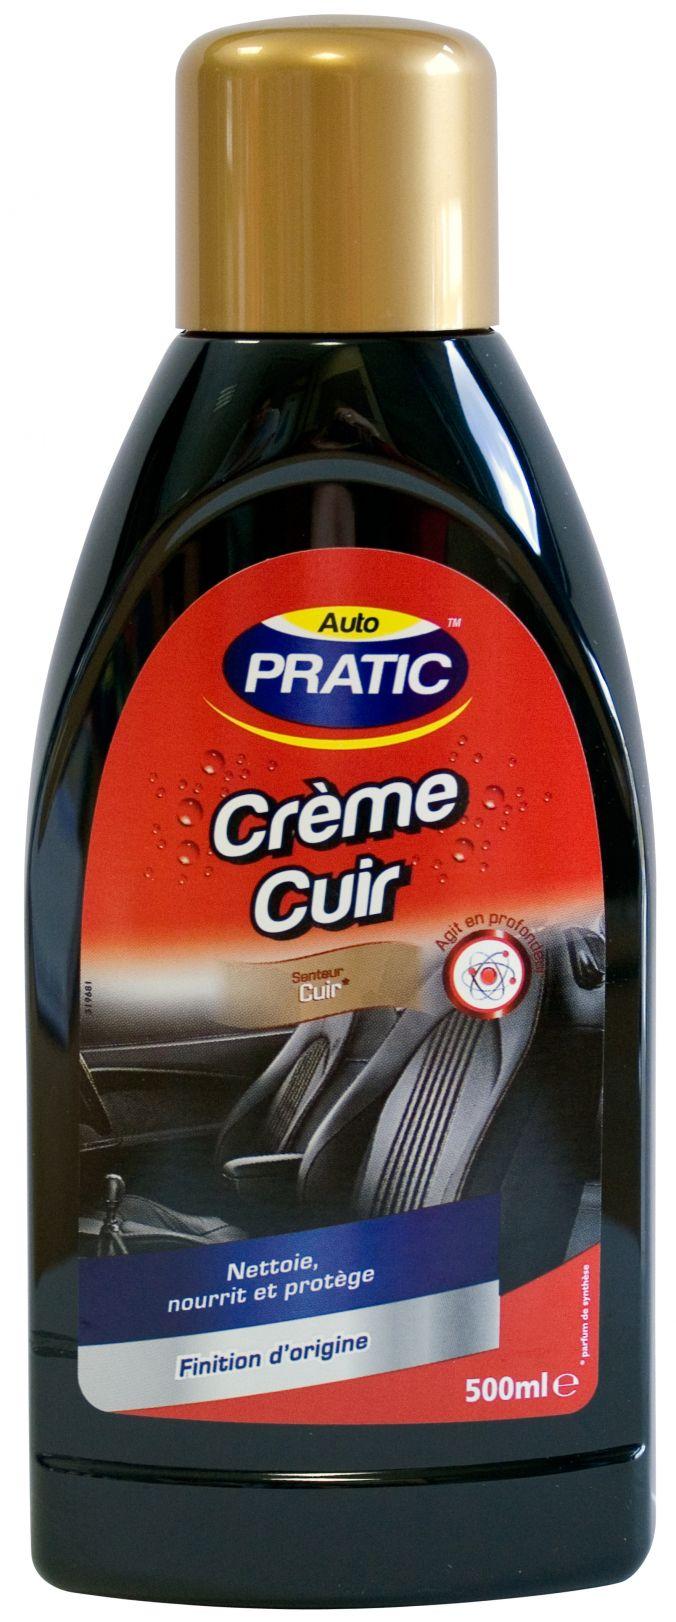 Crème Cuir Auto Pratic 2018